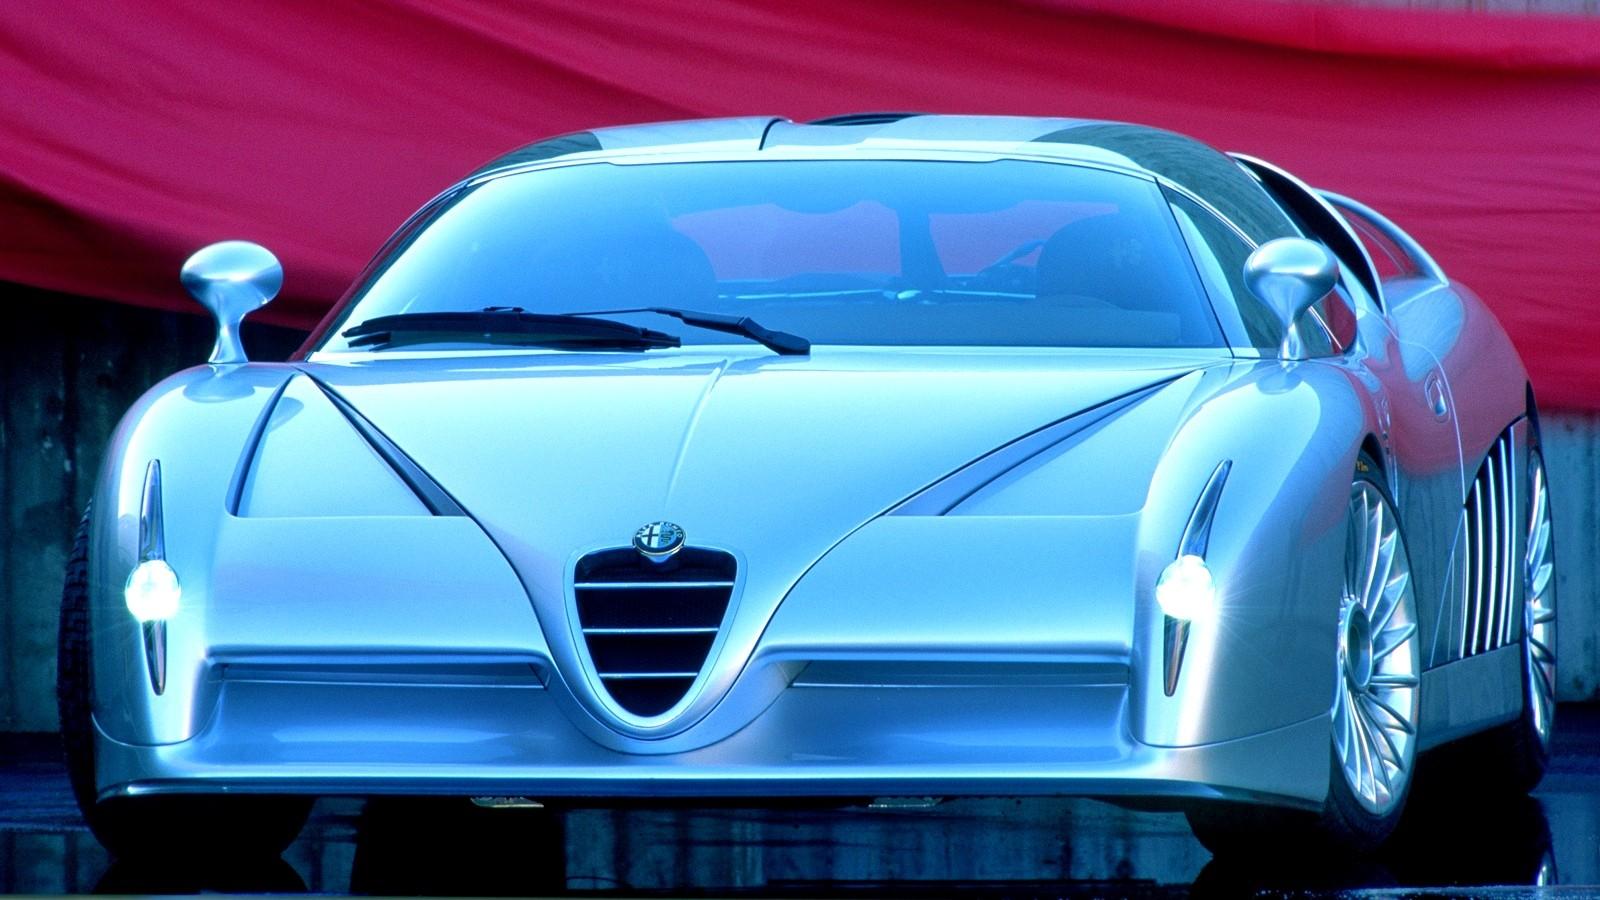 1997 Alfa Romeo Scighera Is Mid-Engine